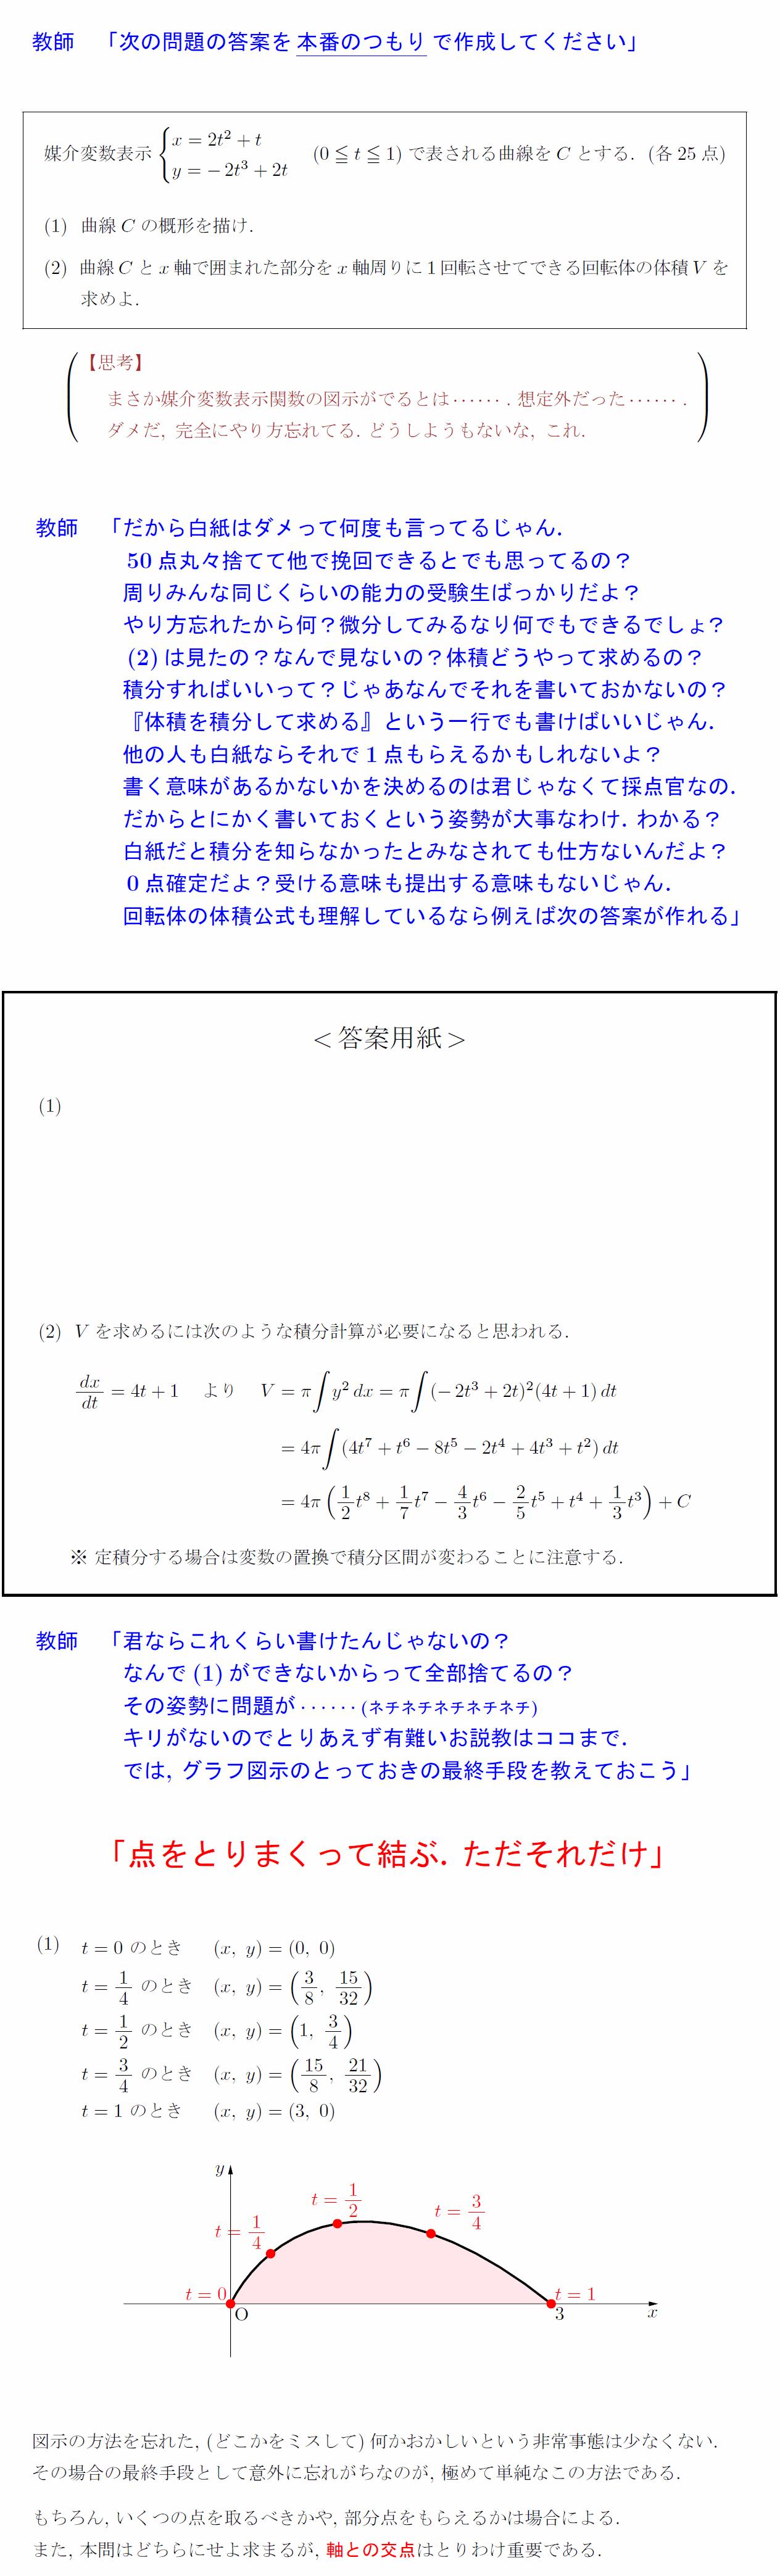 kijyutu-graph